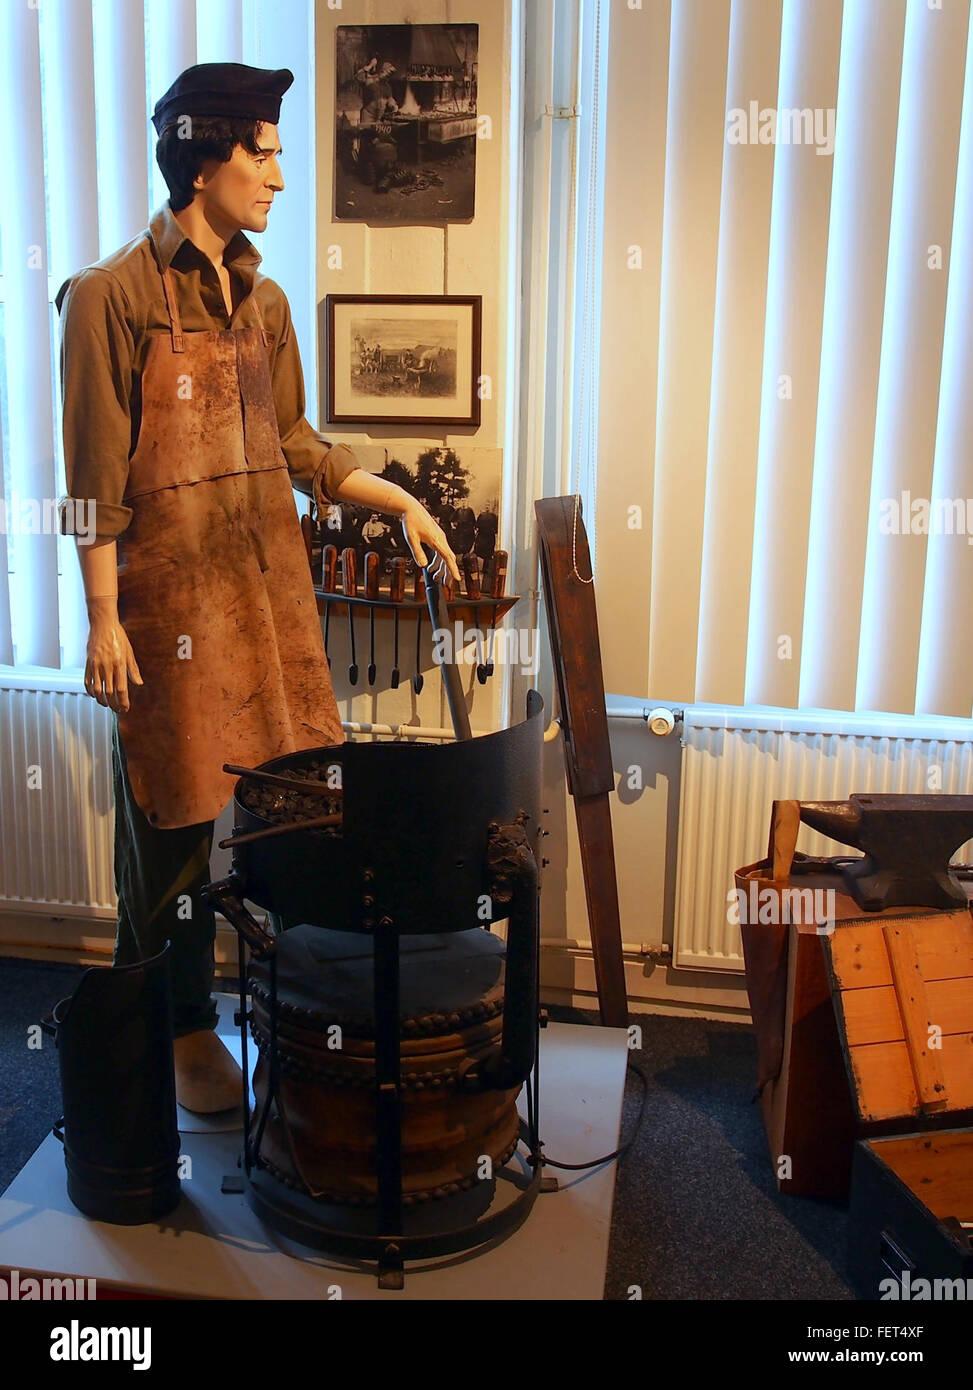 Dutch Cavalry Museum, Bernhardkazerne pic10 - Stock Image